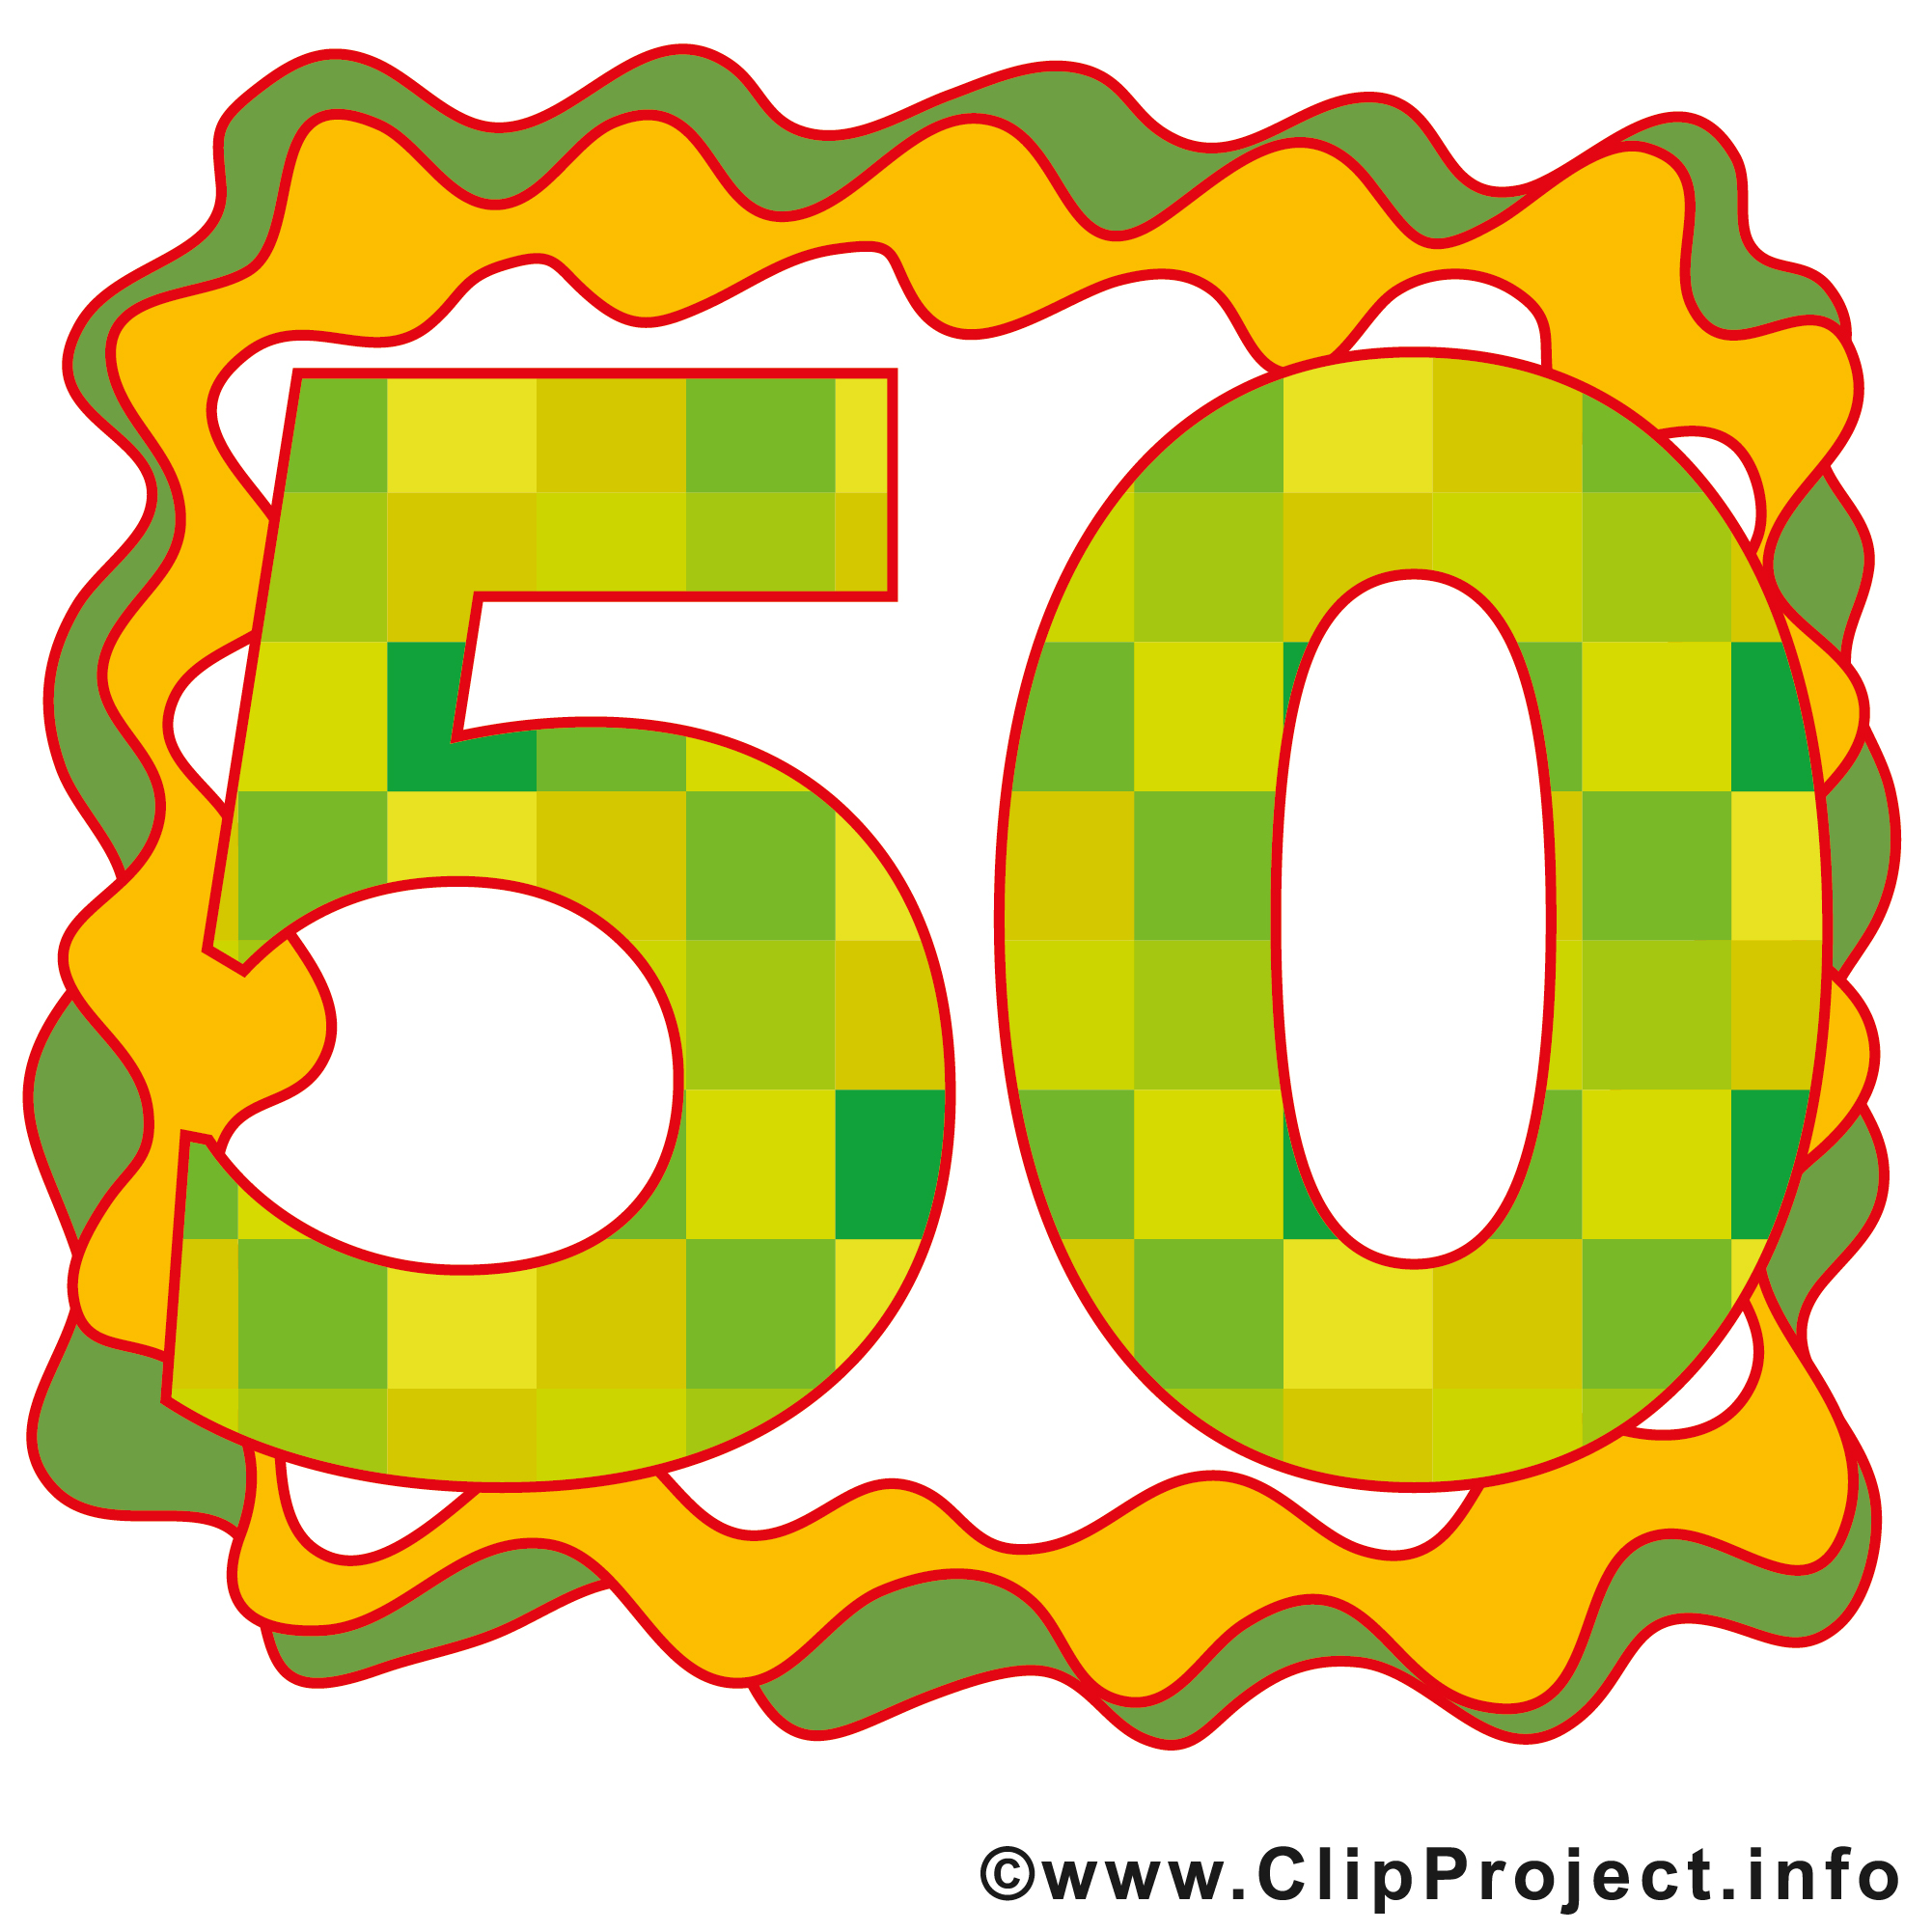 50 clipart clip library library 50 ans clipart - ClipartFest clip library library